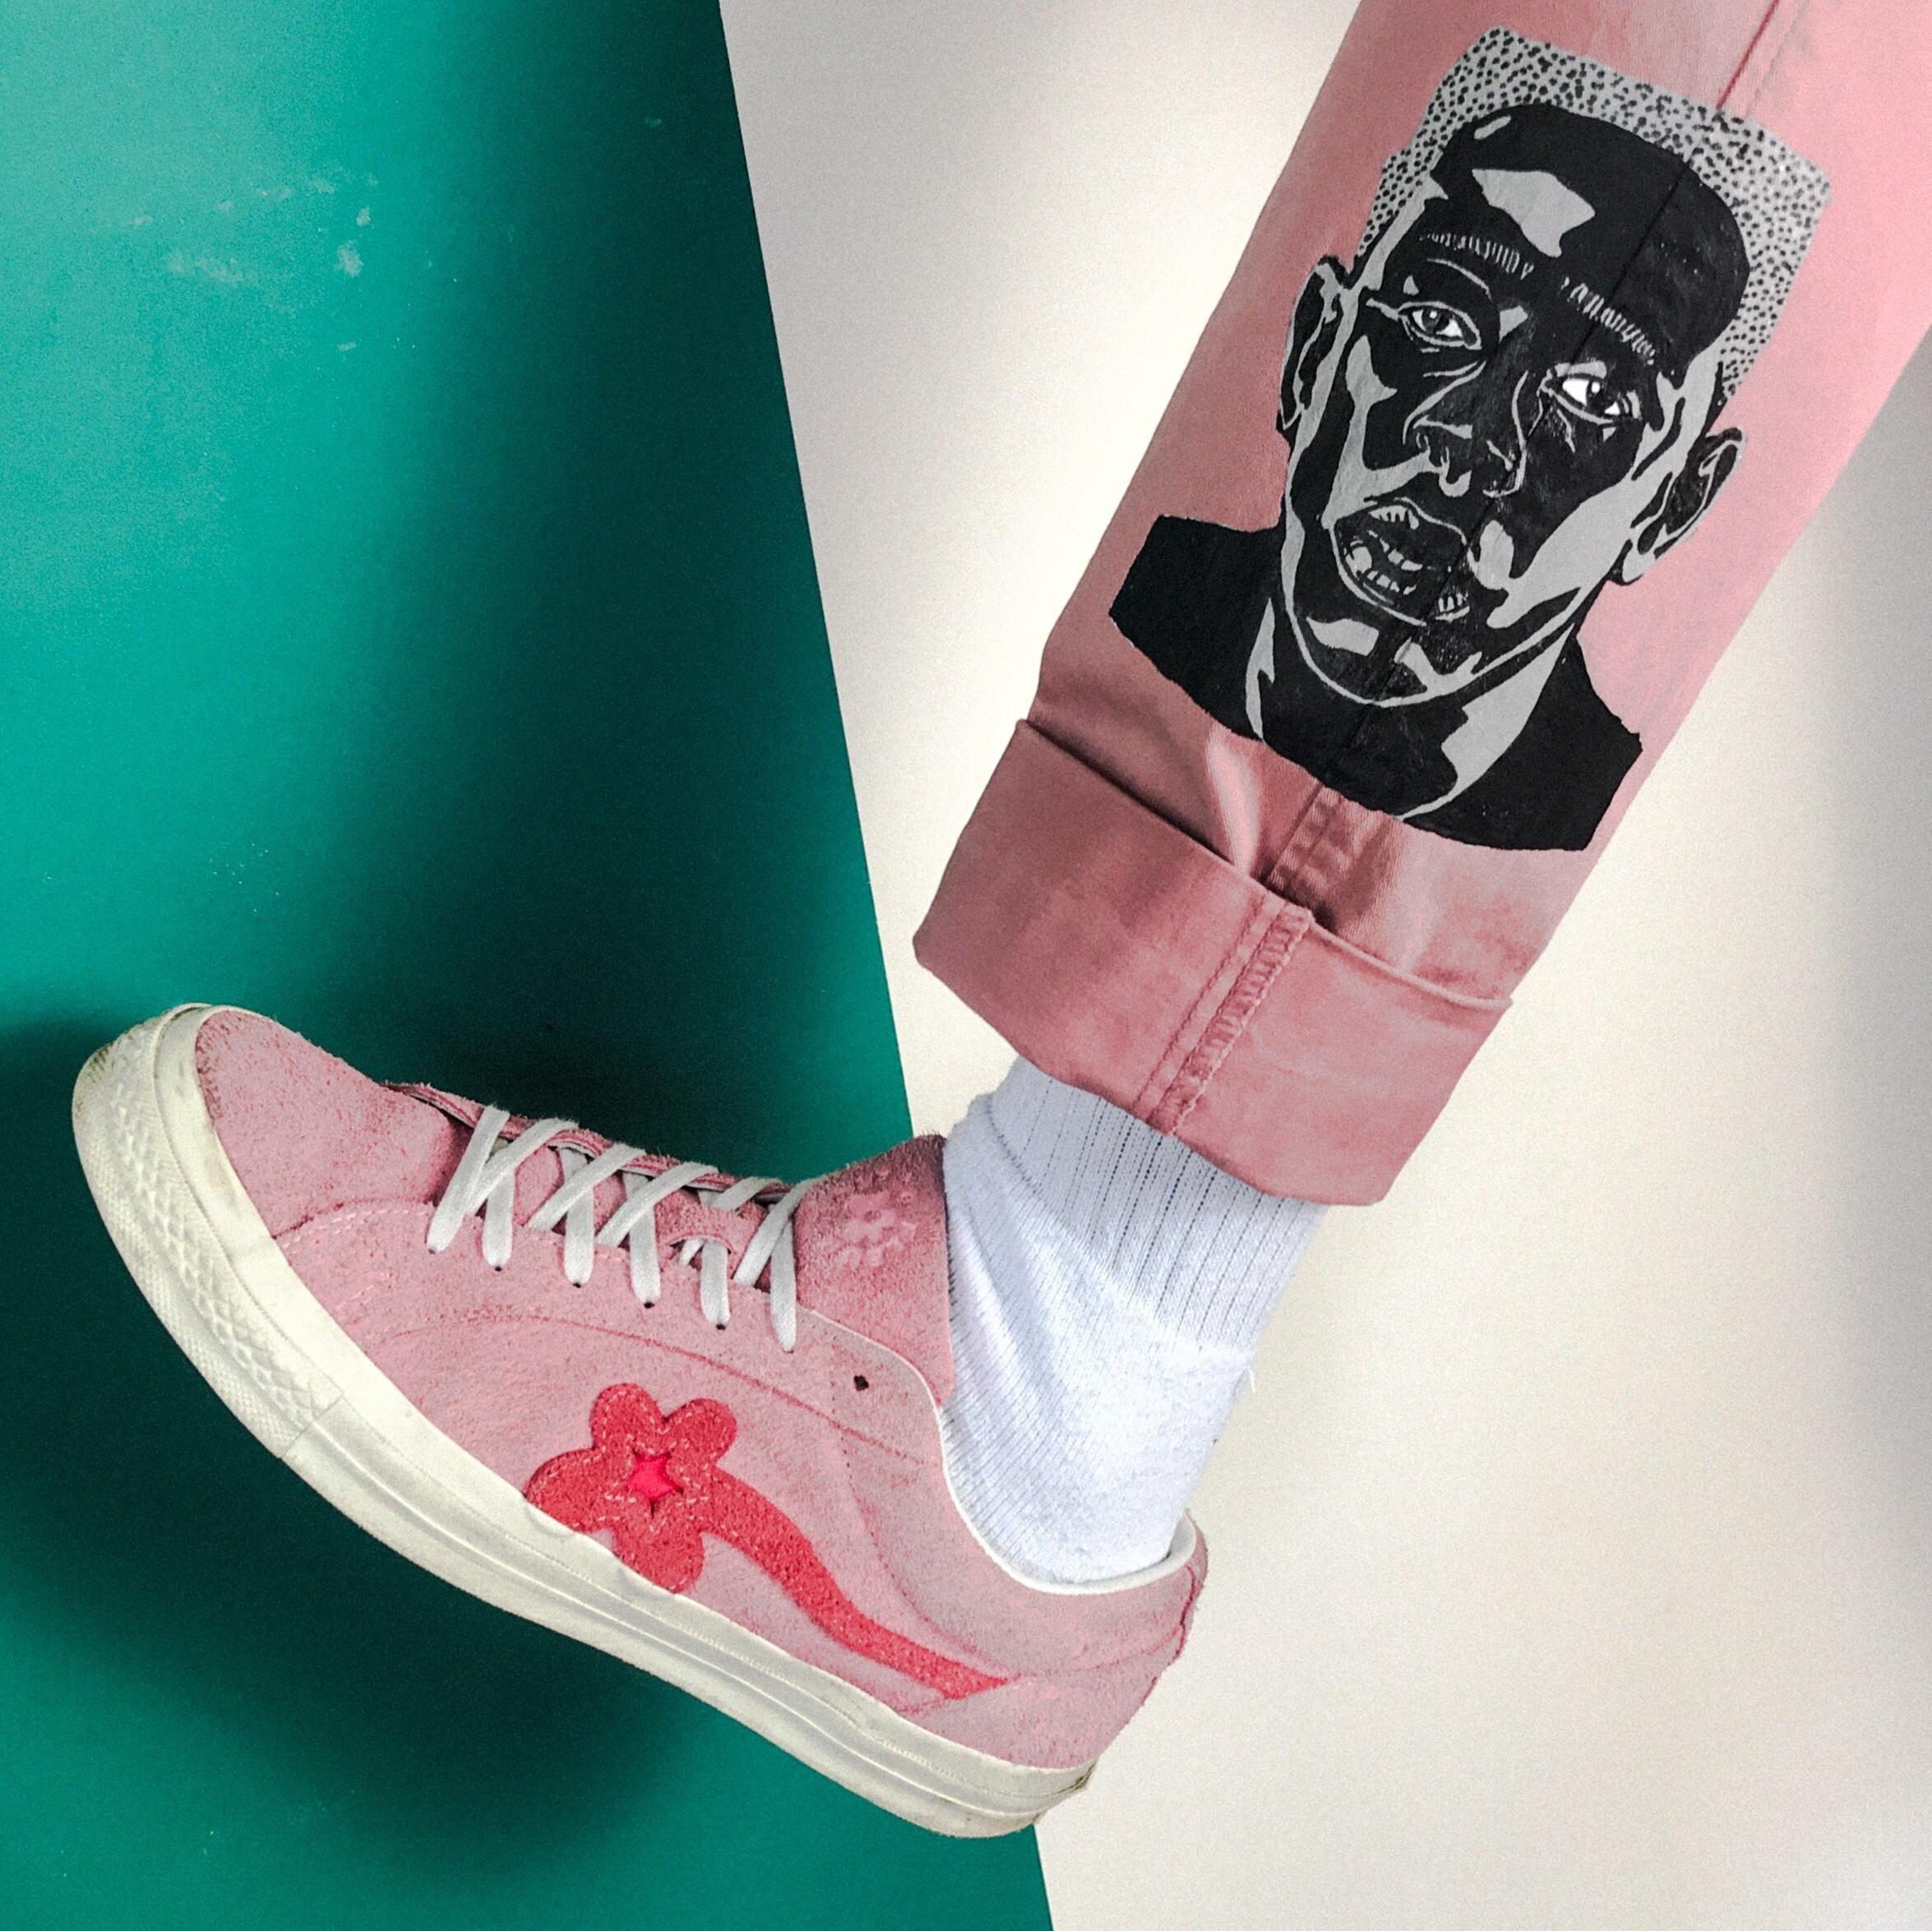 [ART] Hand painted custom pants. VOTE IGOR